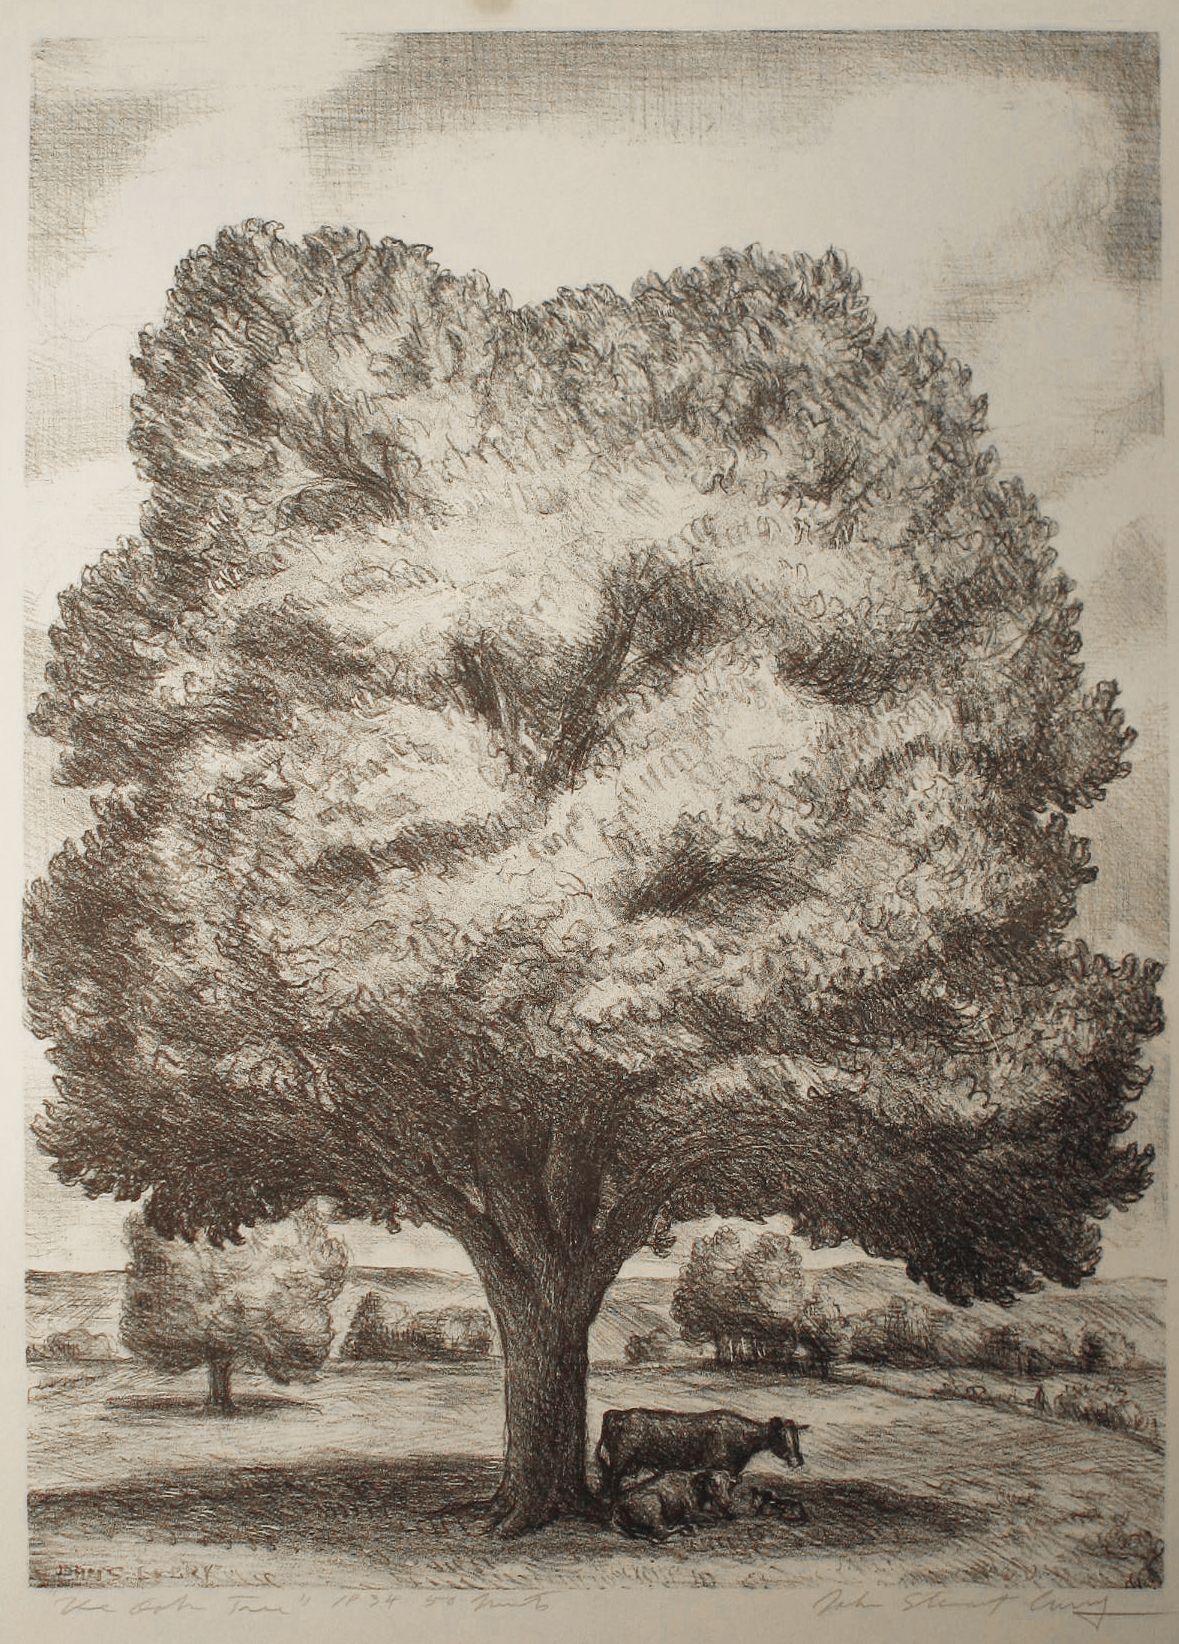 John Steuart Curry (1897-1946) , The Oak Tree, 1934